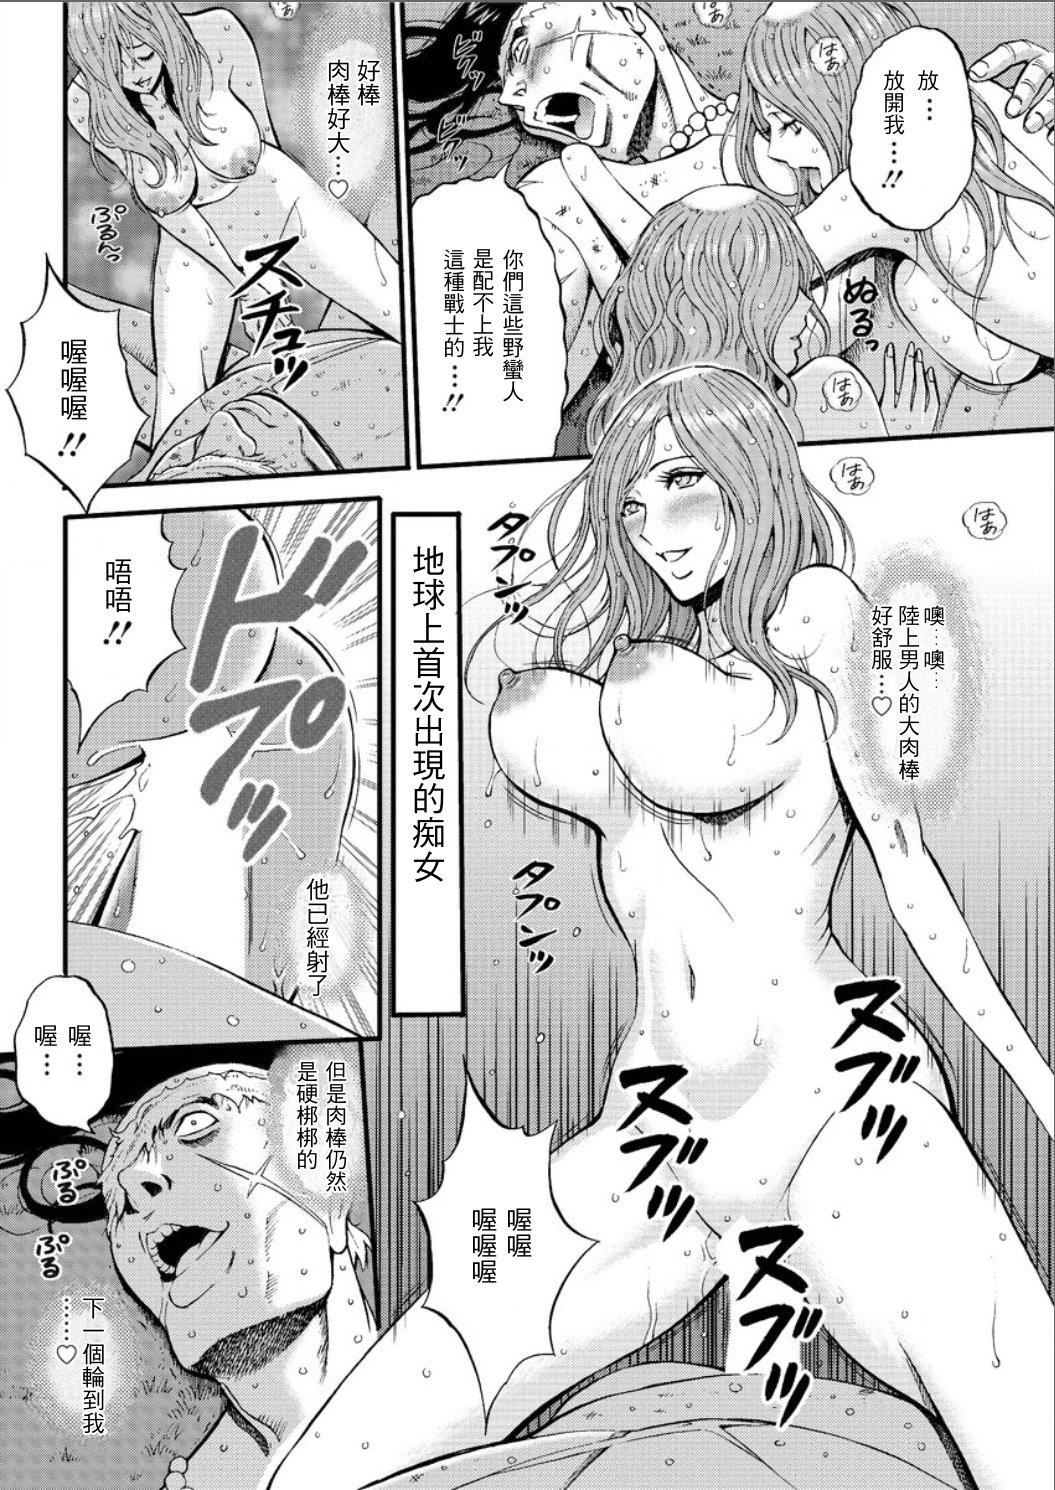 Kigenzen 10000 Nen no Ota | 史前一萬年的宅男 Ch. 19-24 29